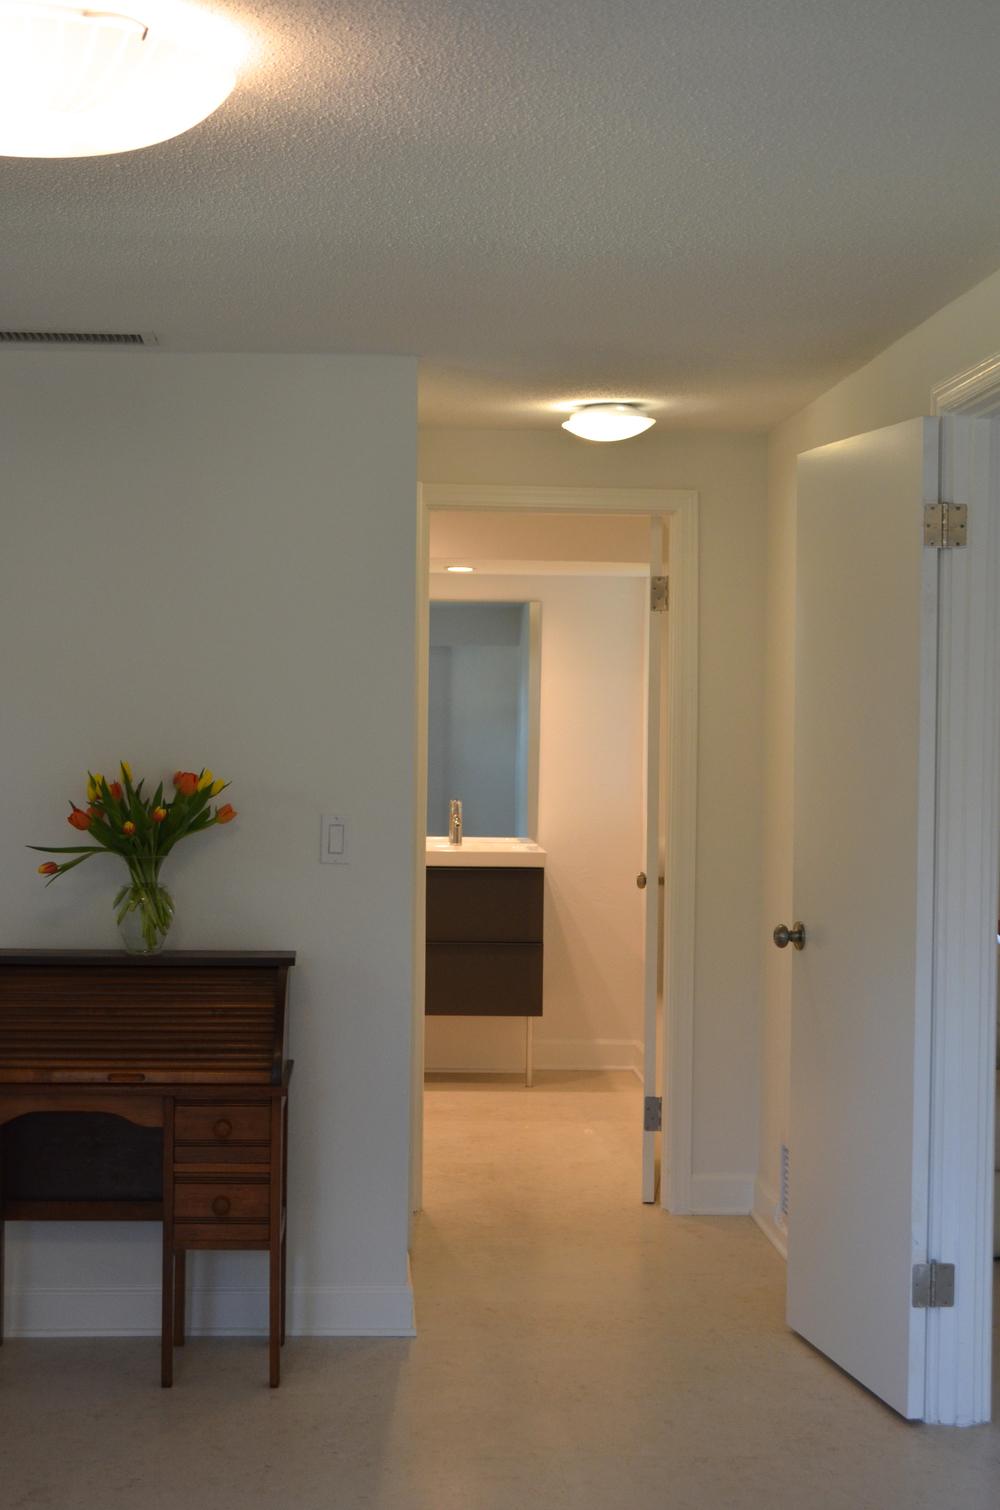 Master Bedroom to Master Bathroom